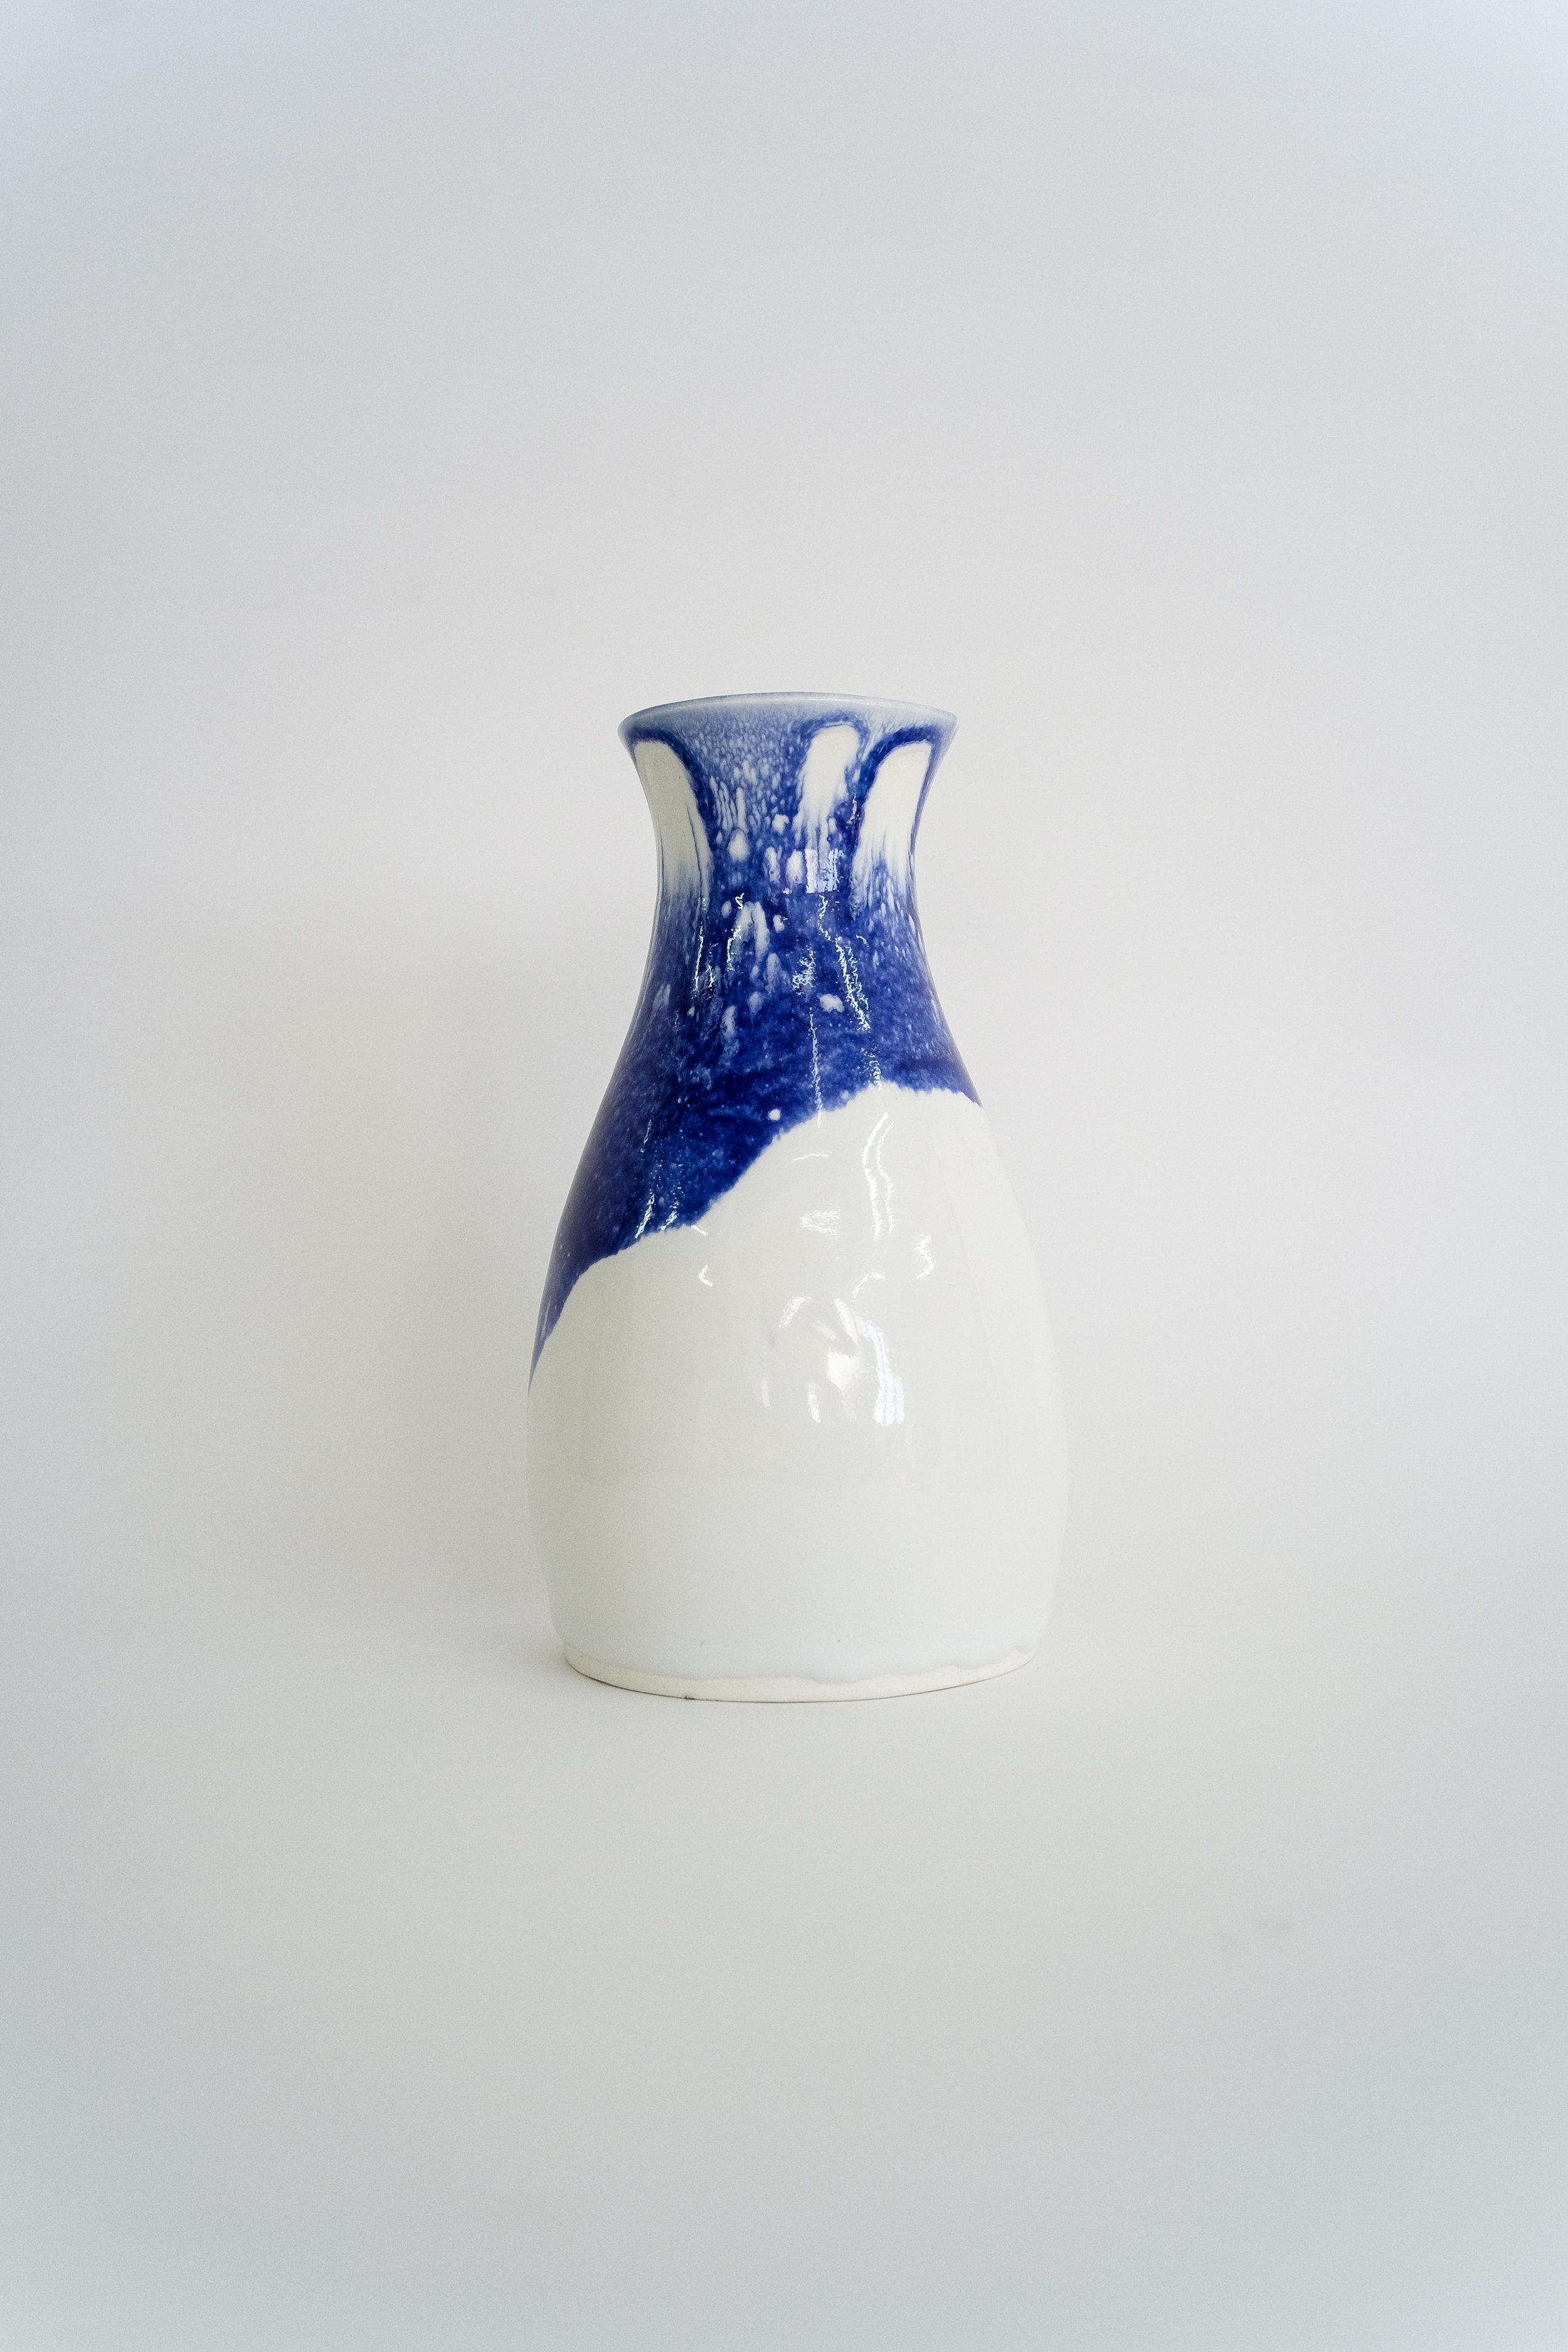 藍白釉白瓷花瓶 Blue & White Glaze Vase 2016